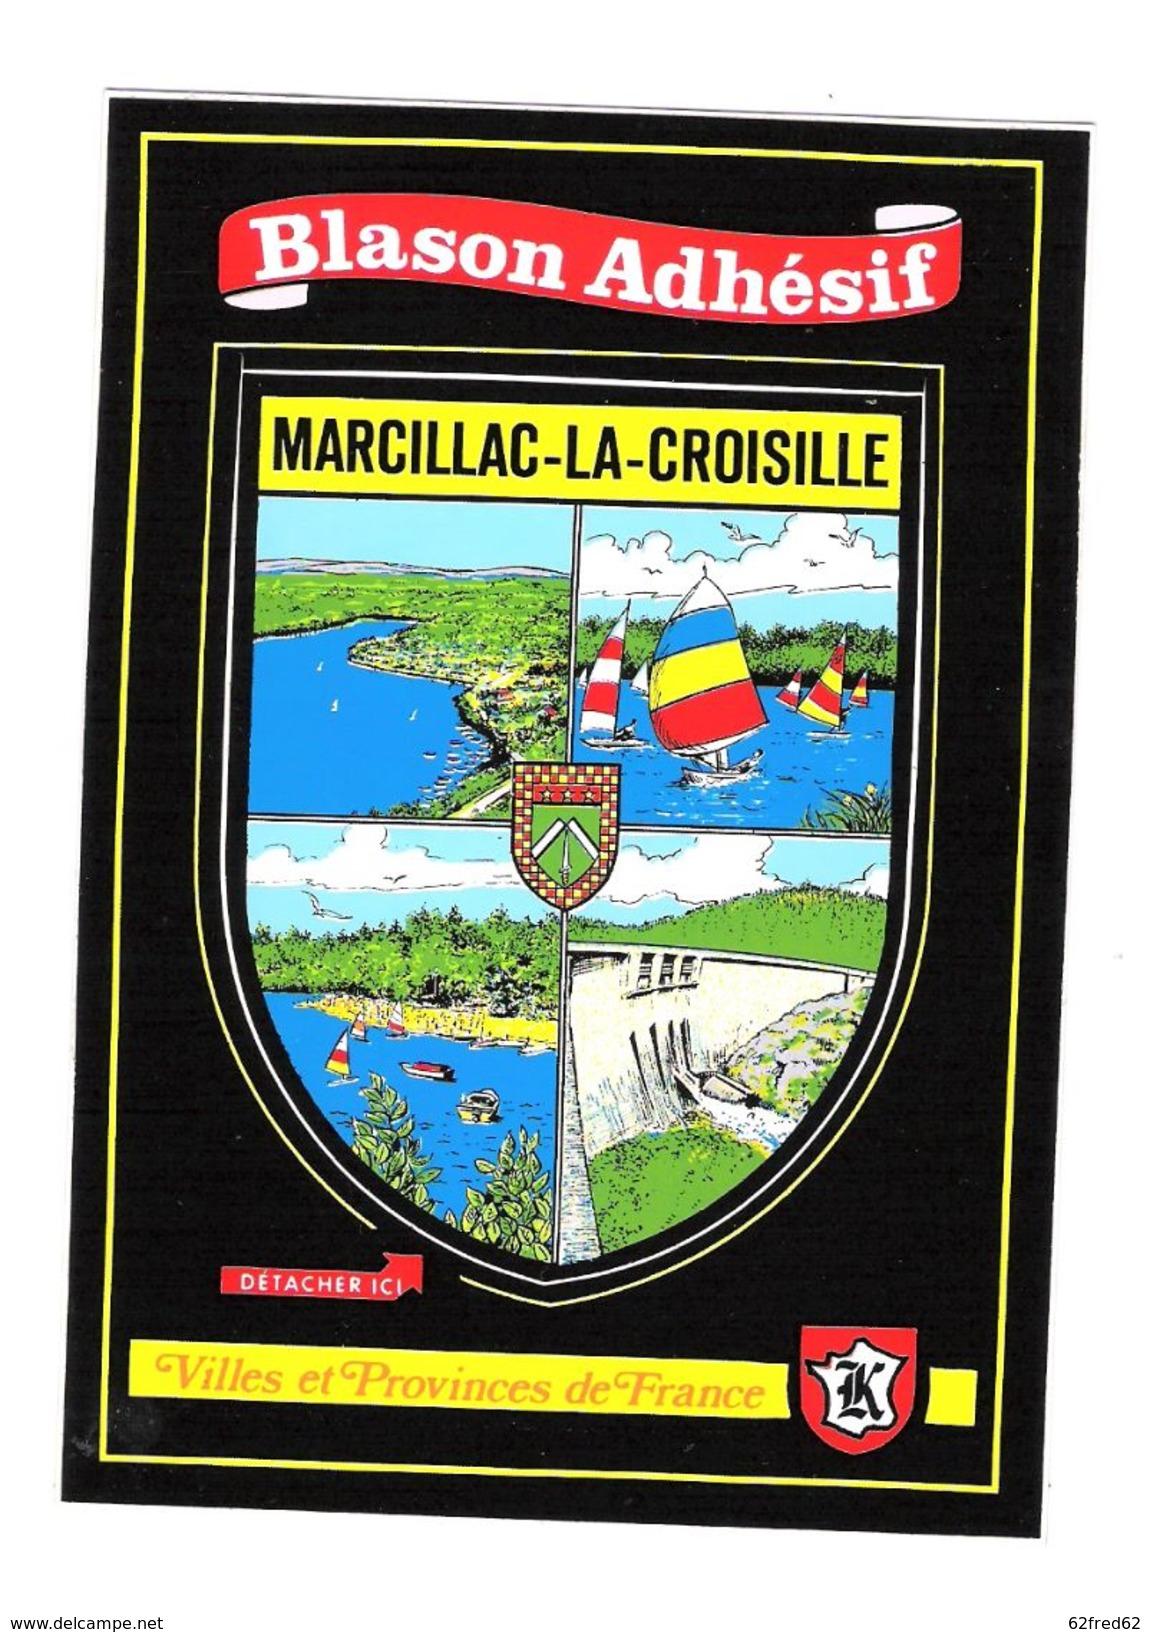 BLASON ADHESIF - MARCILLAC LA CROISILLE - France